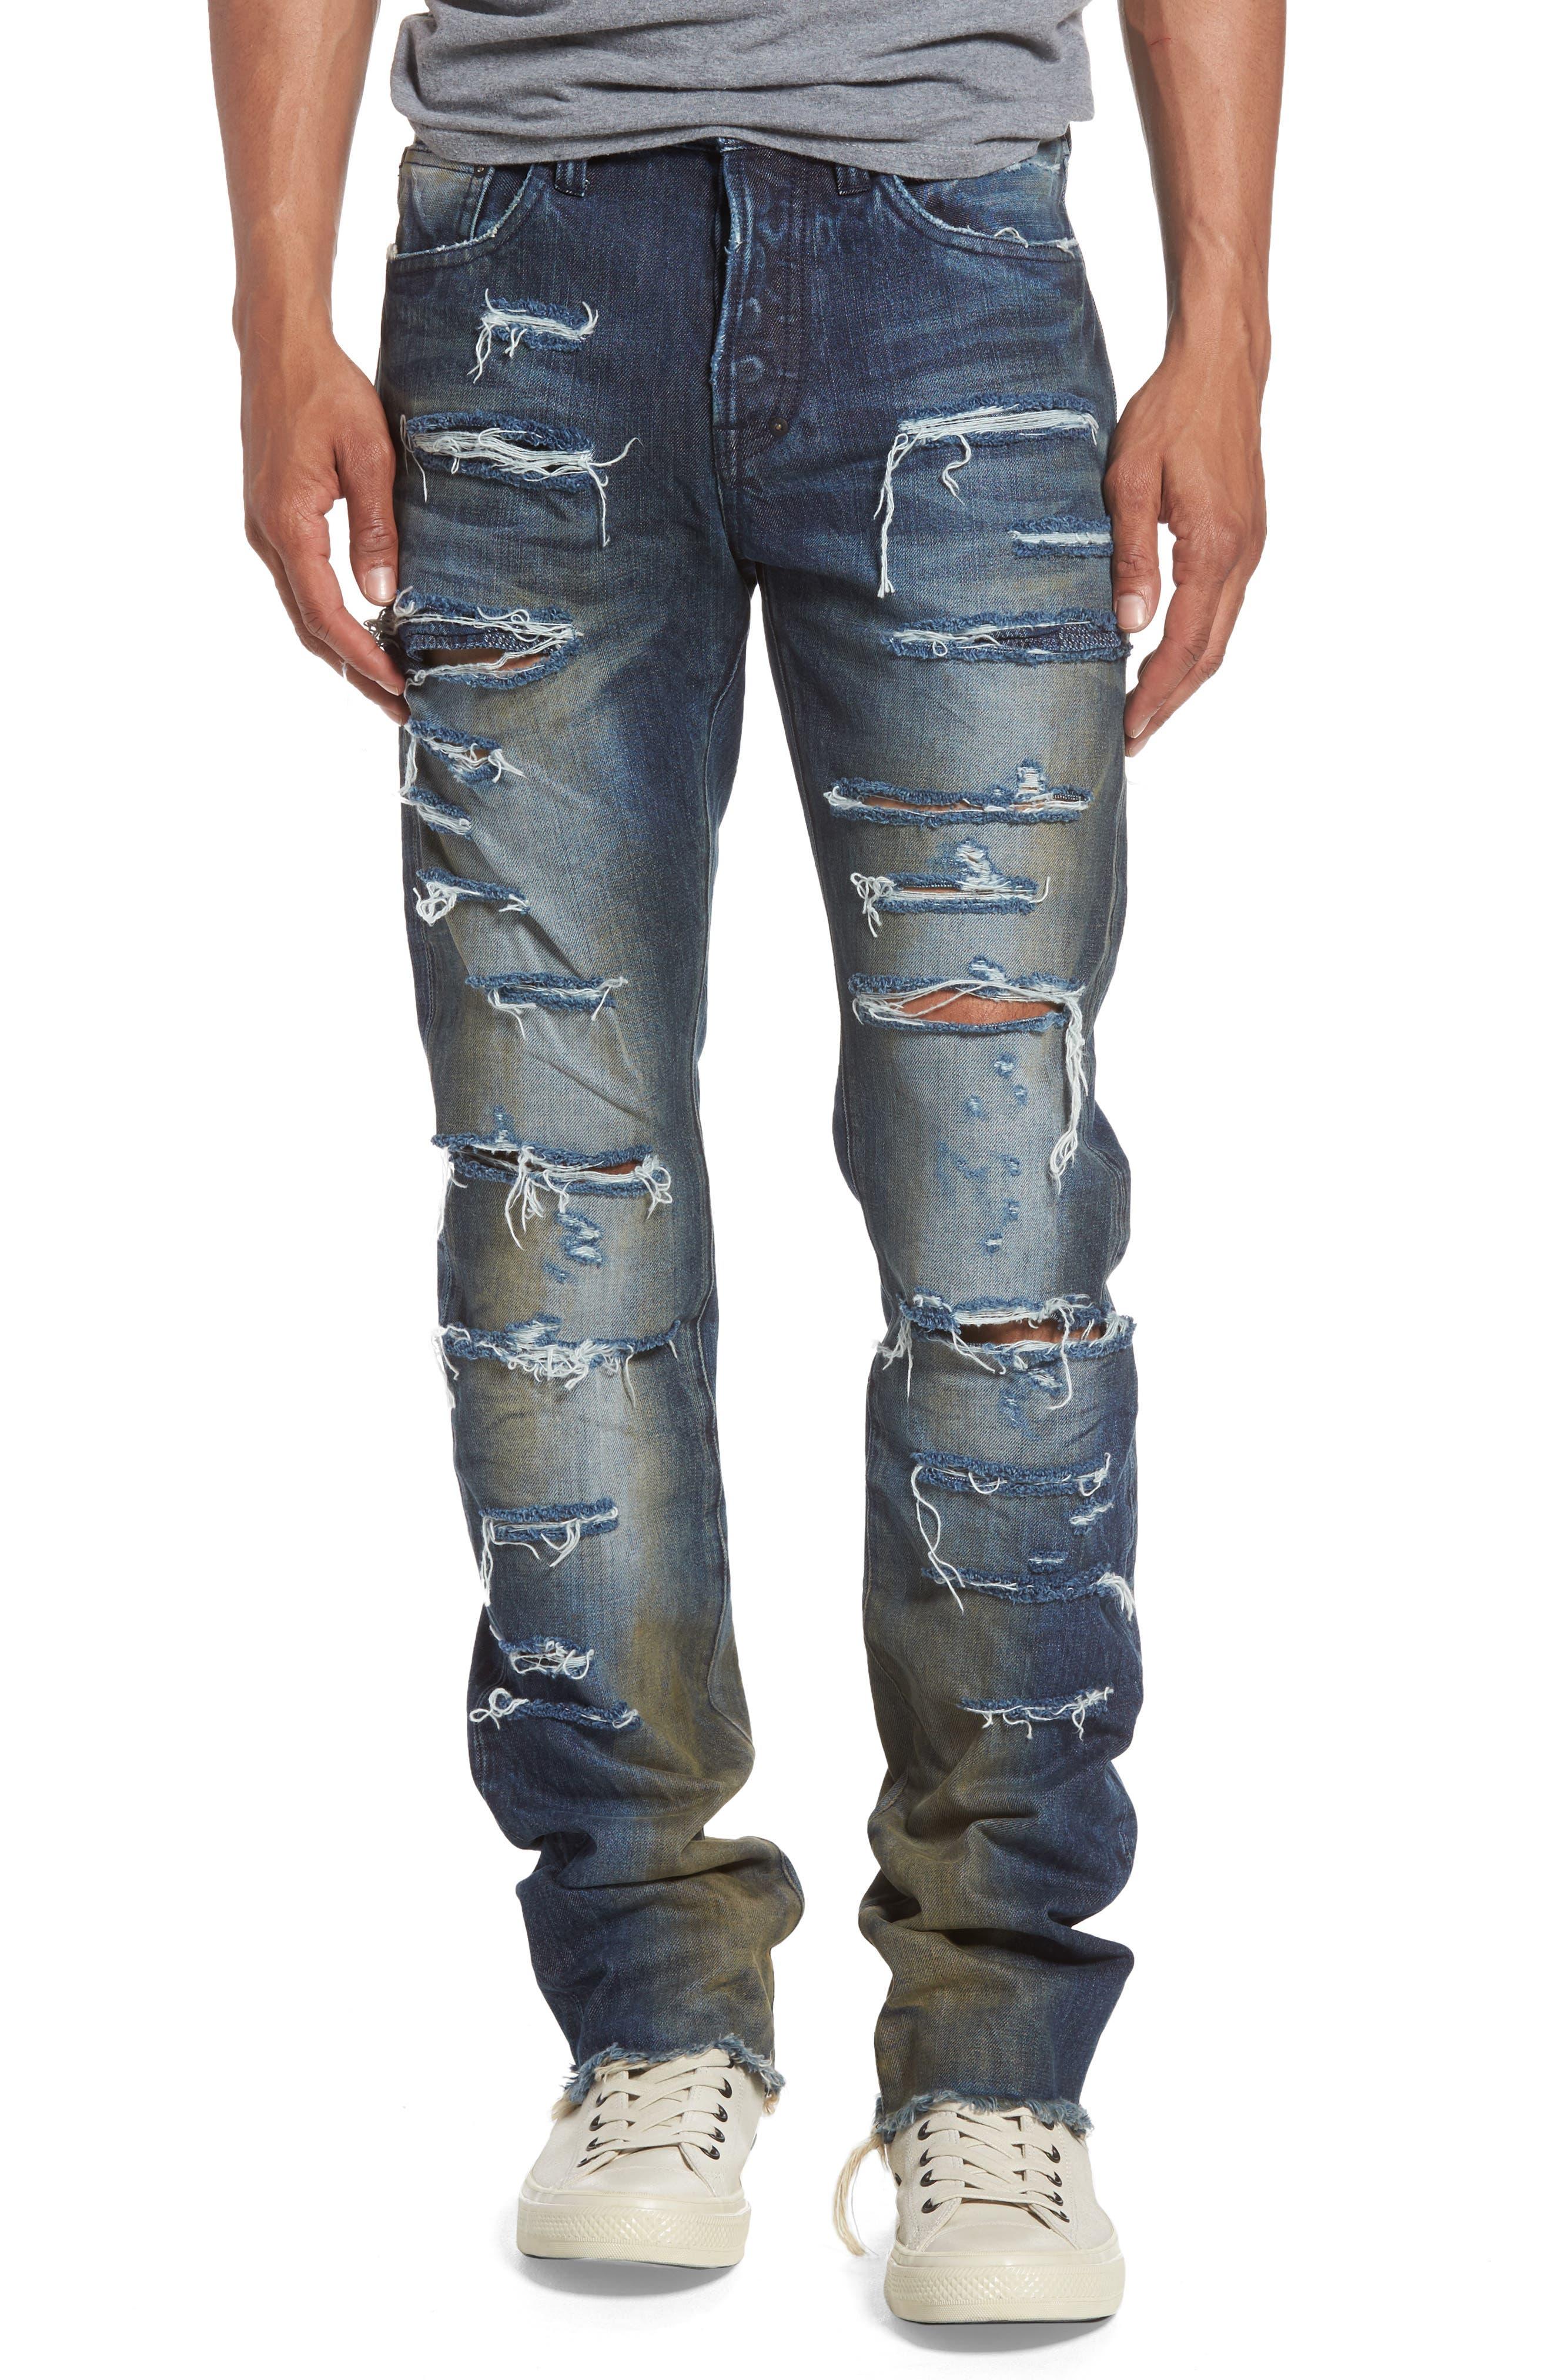 Demon Slim Straight Leg Jeans,                         Main,                         color, 490